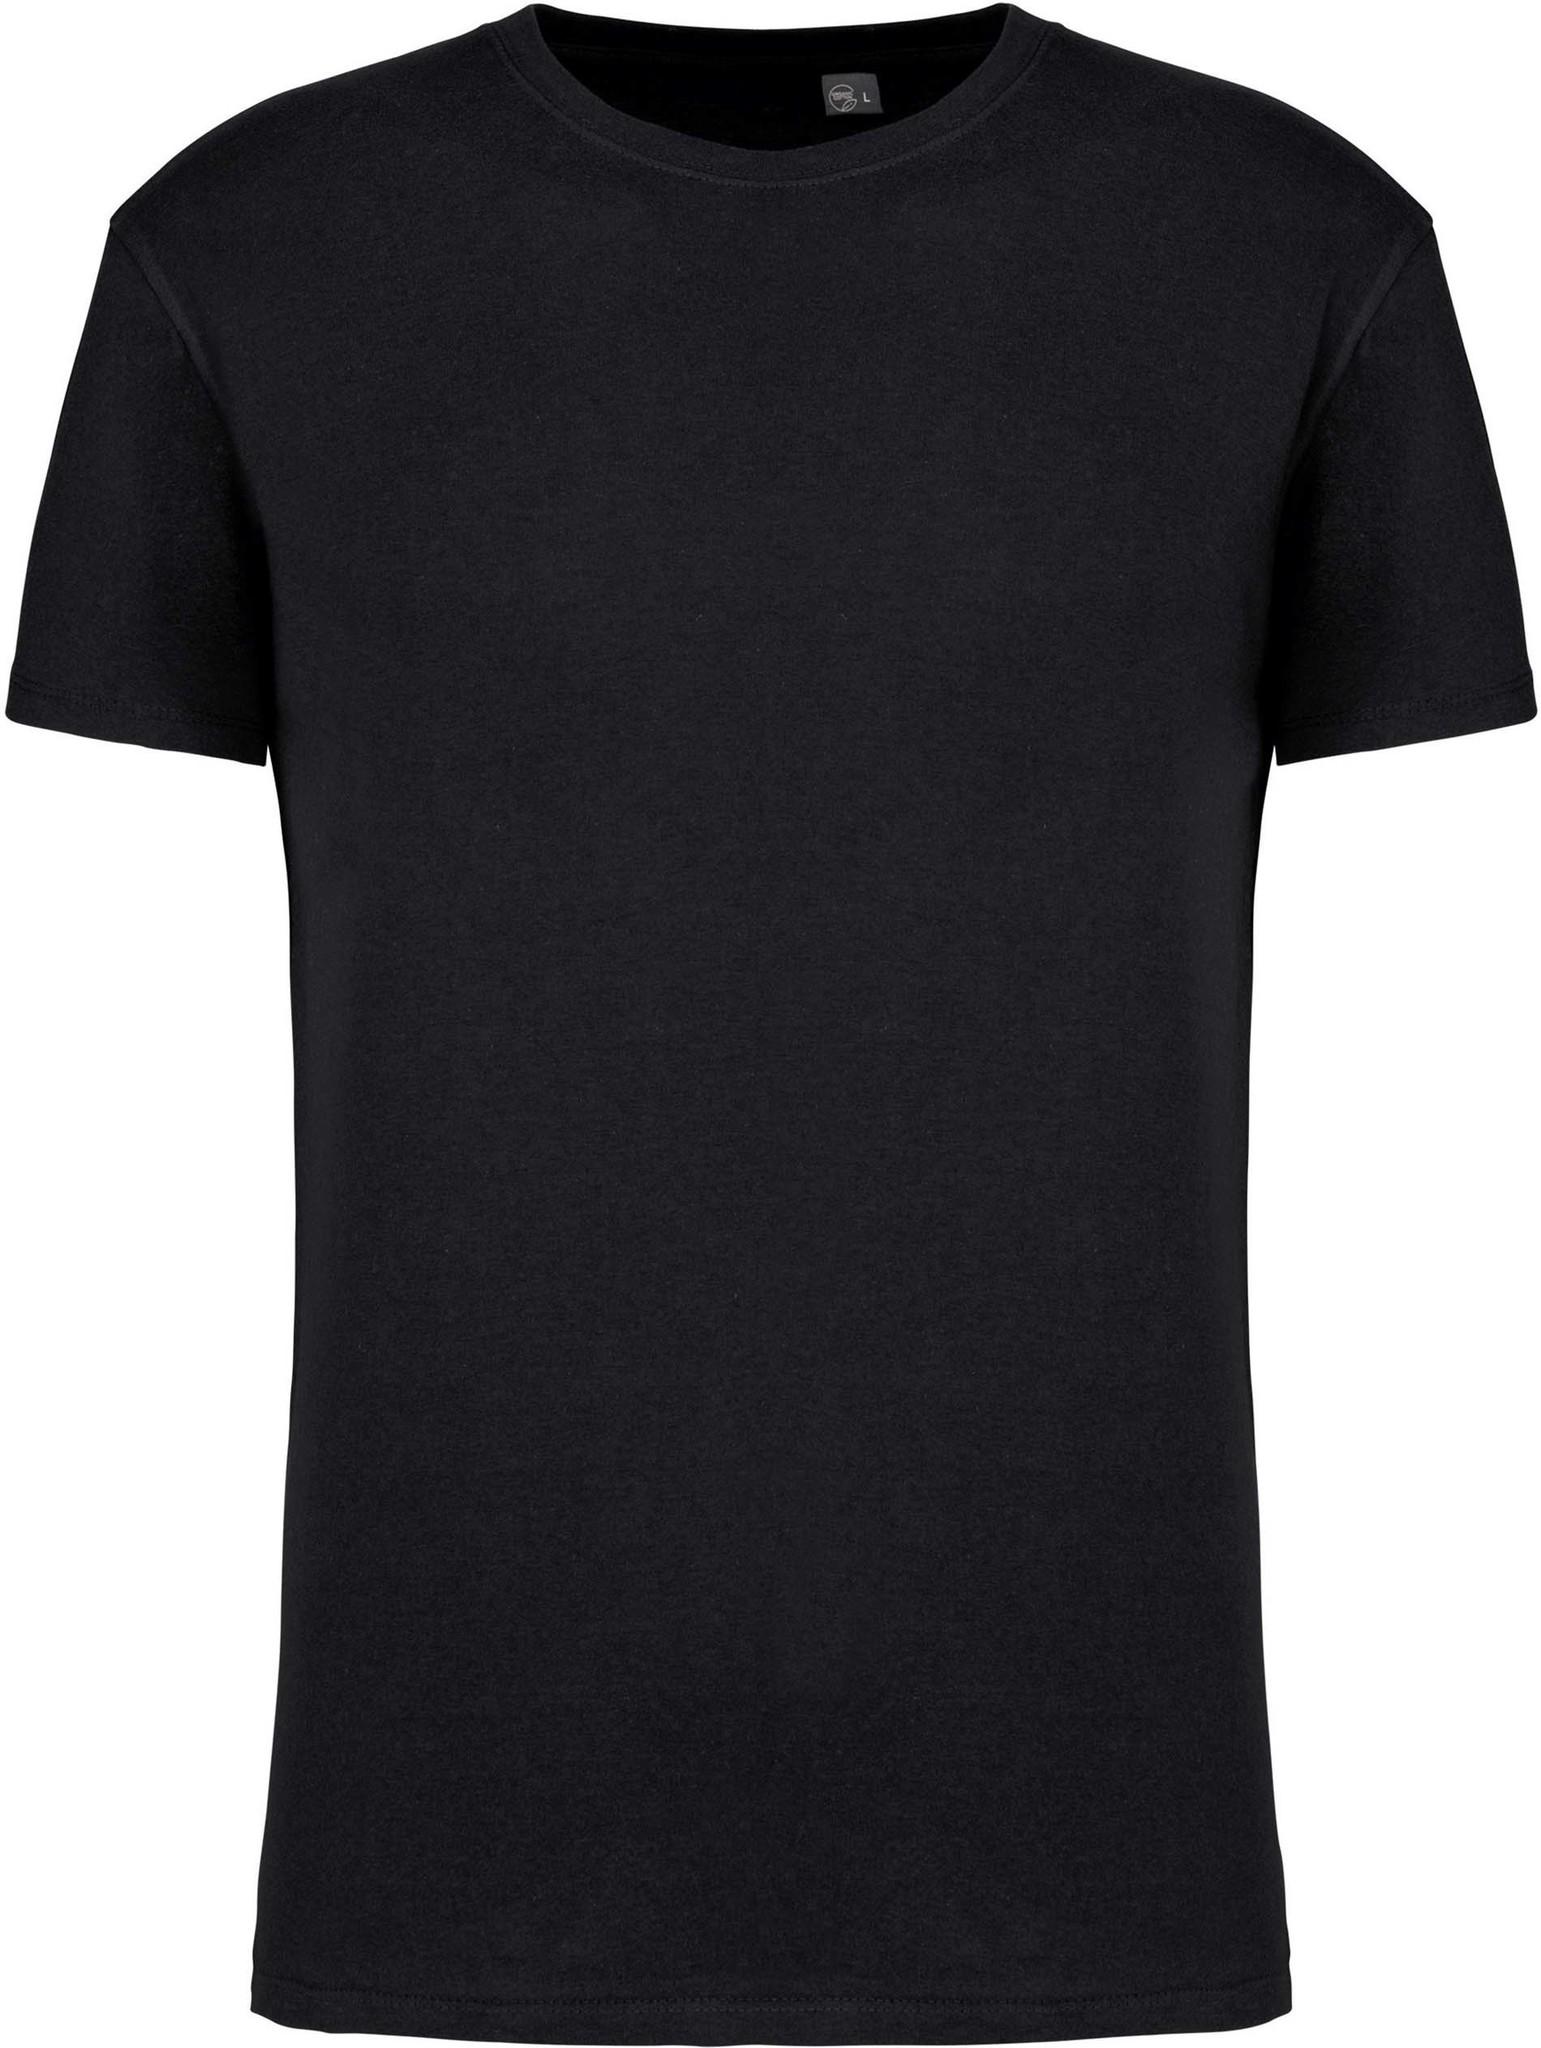 Eco-Friendly Unisex T-shirt - Black